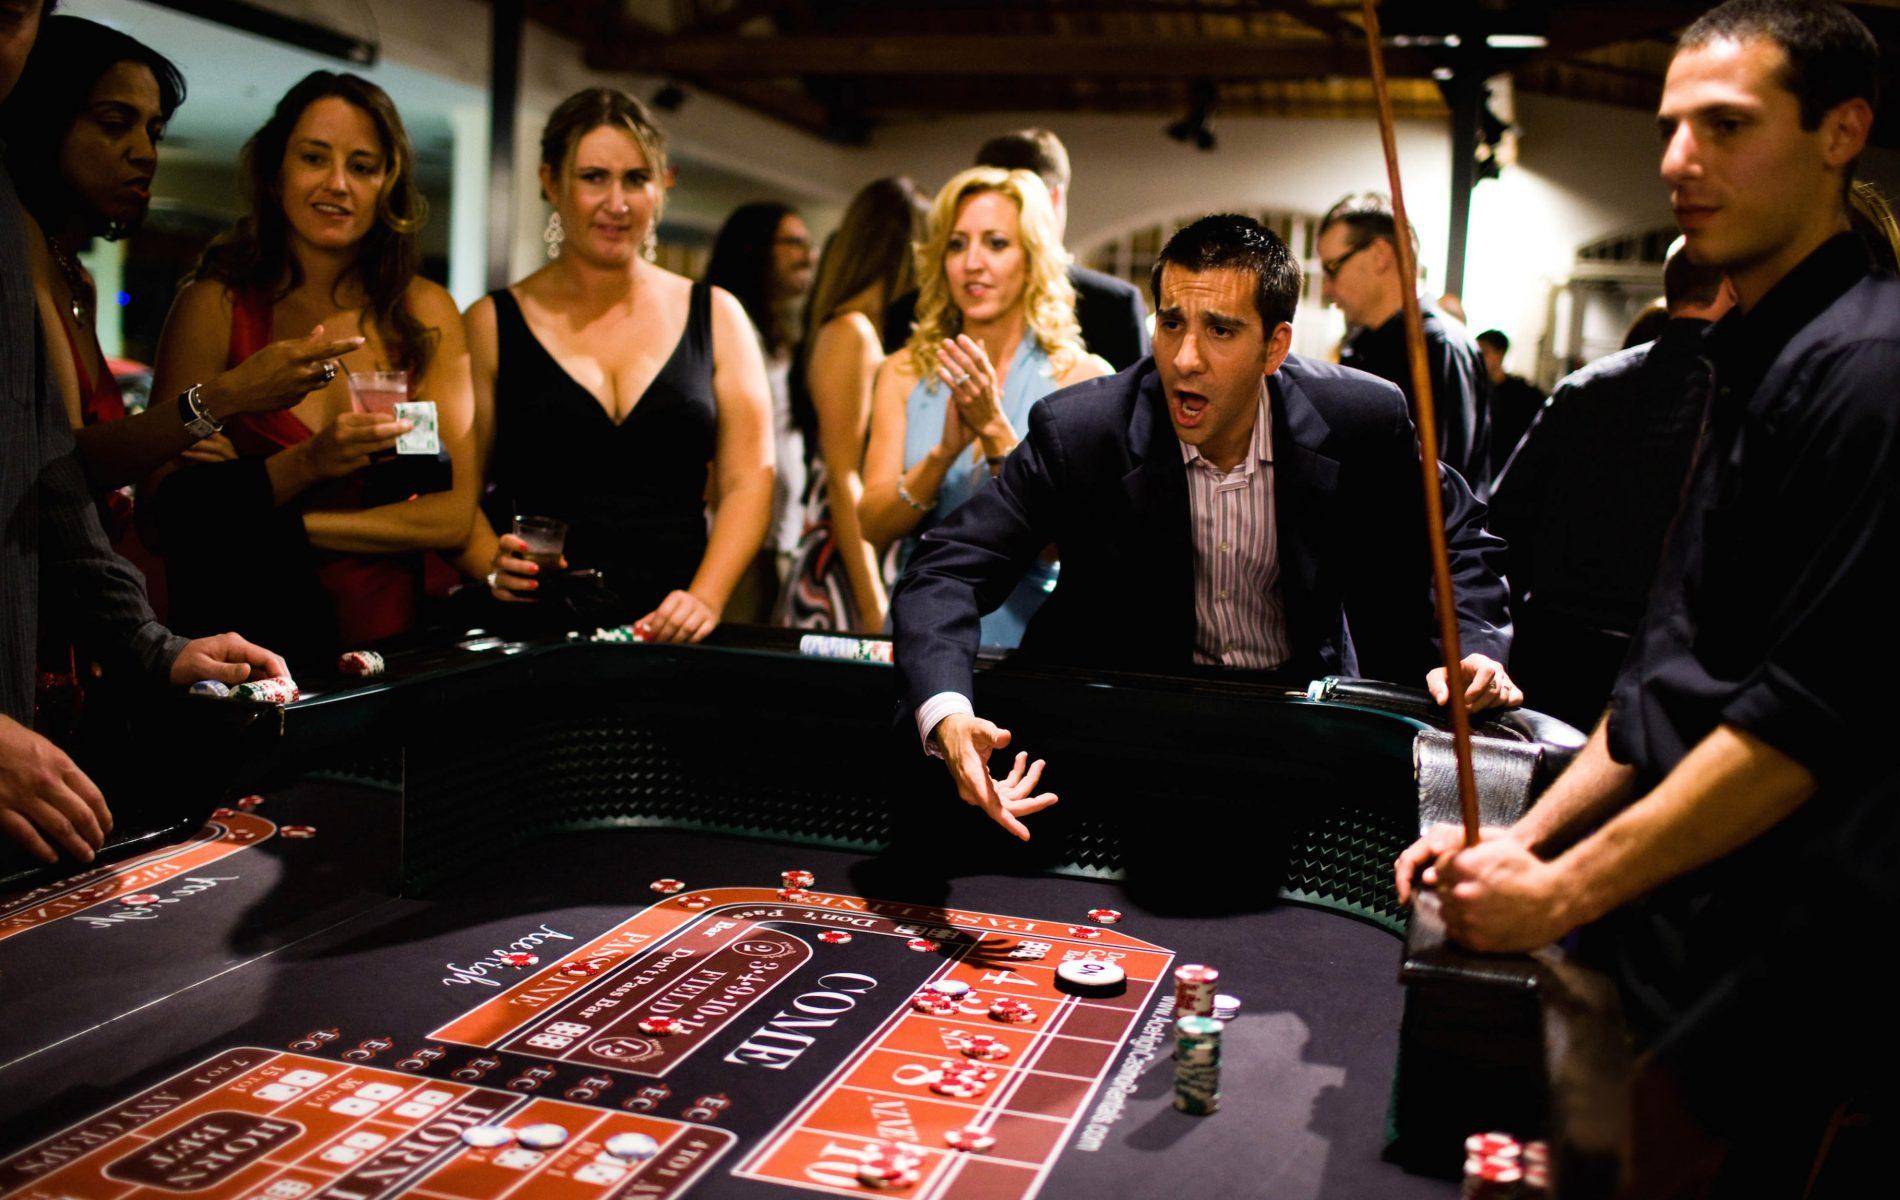 craps-table-rental-ace-high-casino-rentals